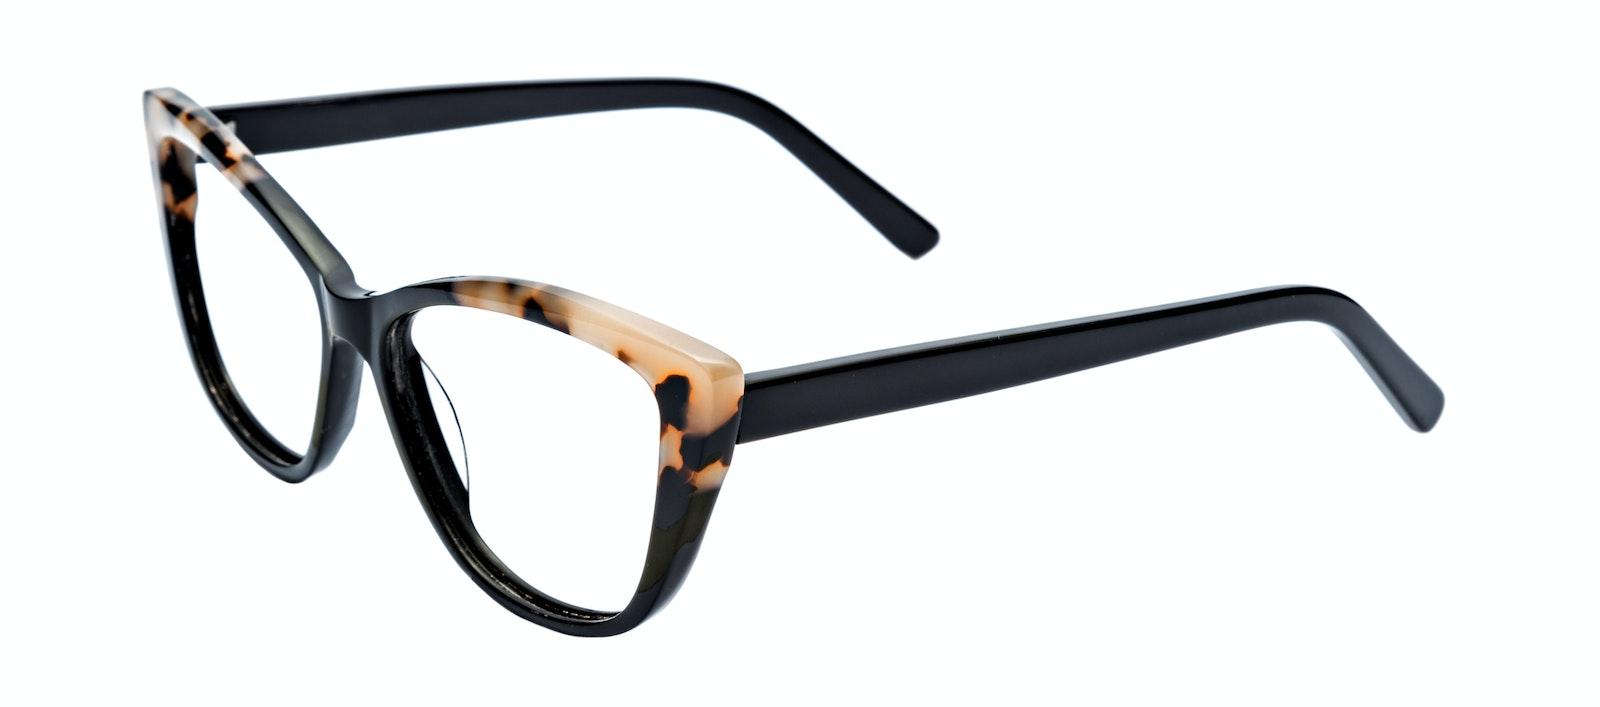 7c2e8cfa36cc Affordable Fashion Glasses Cat Eye Daring Cateye Eyeglasses Women Dolled Up Ebony  Granite Tilt